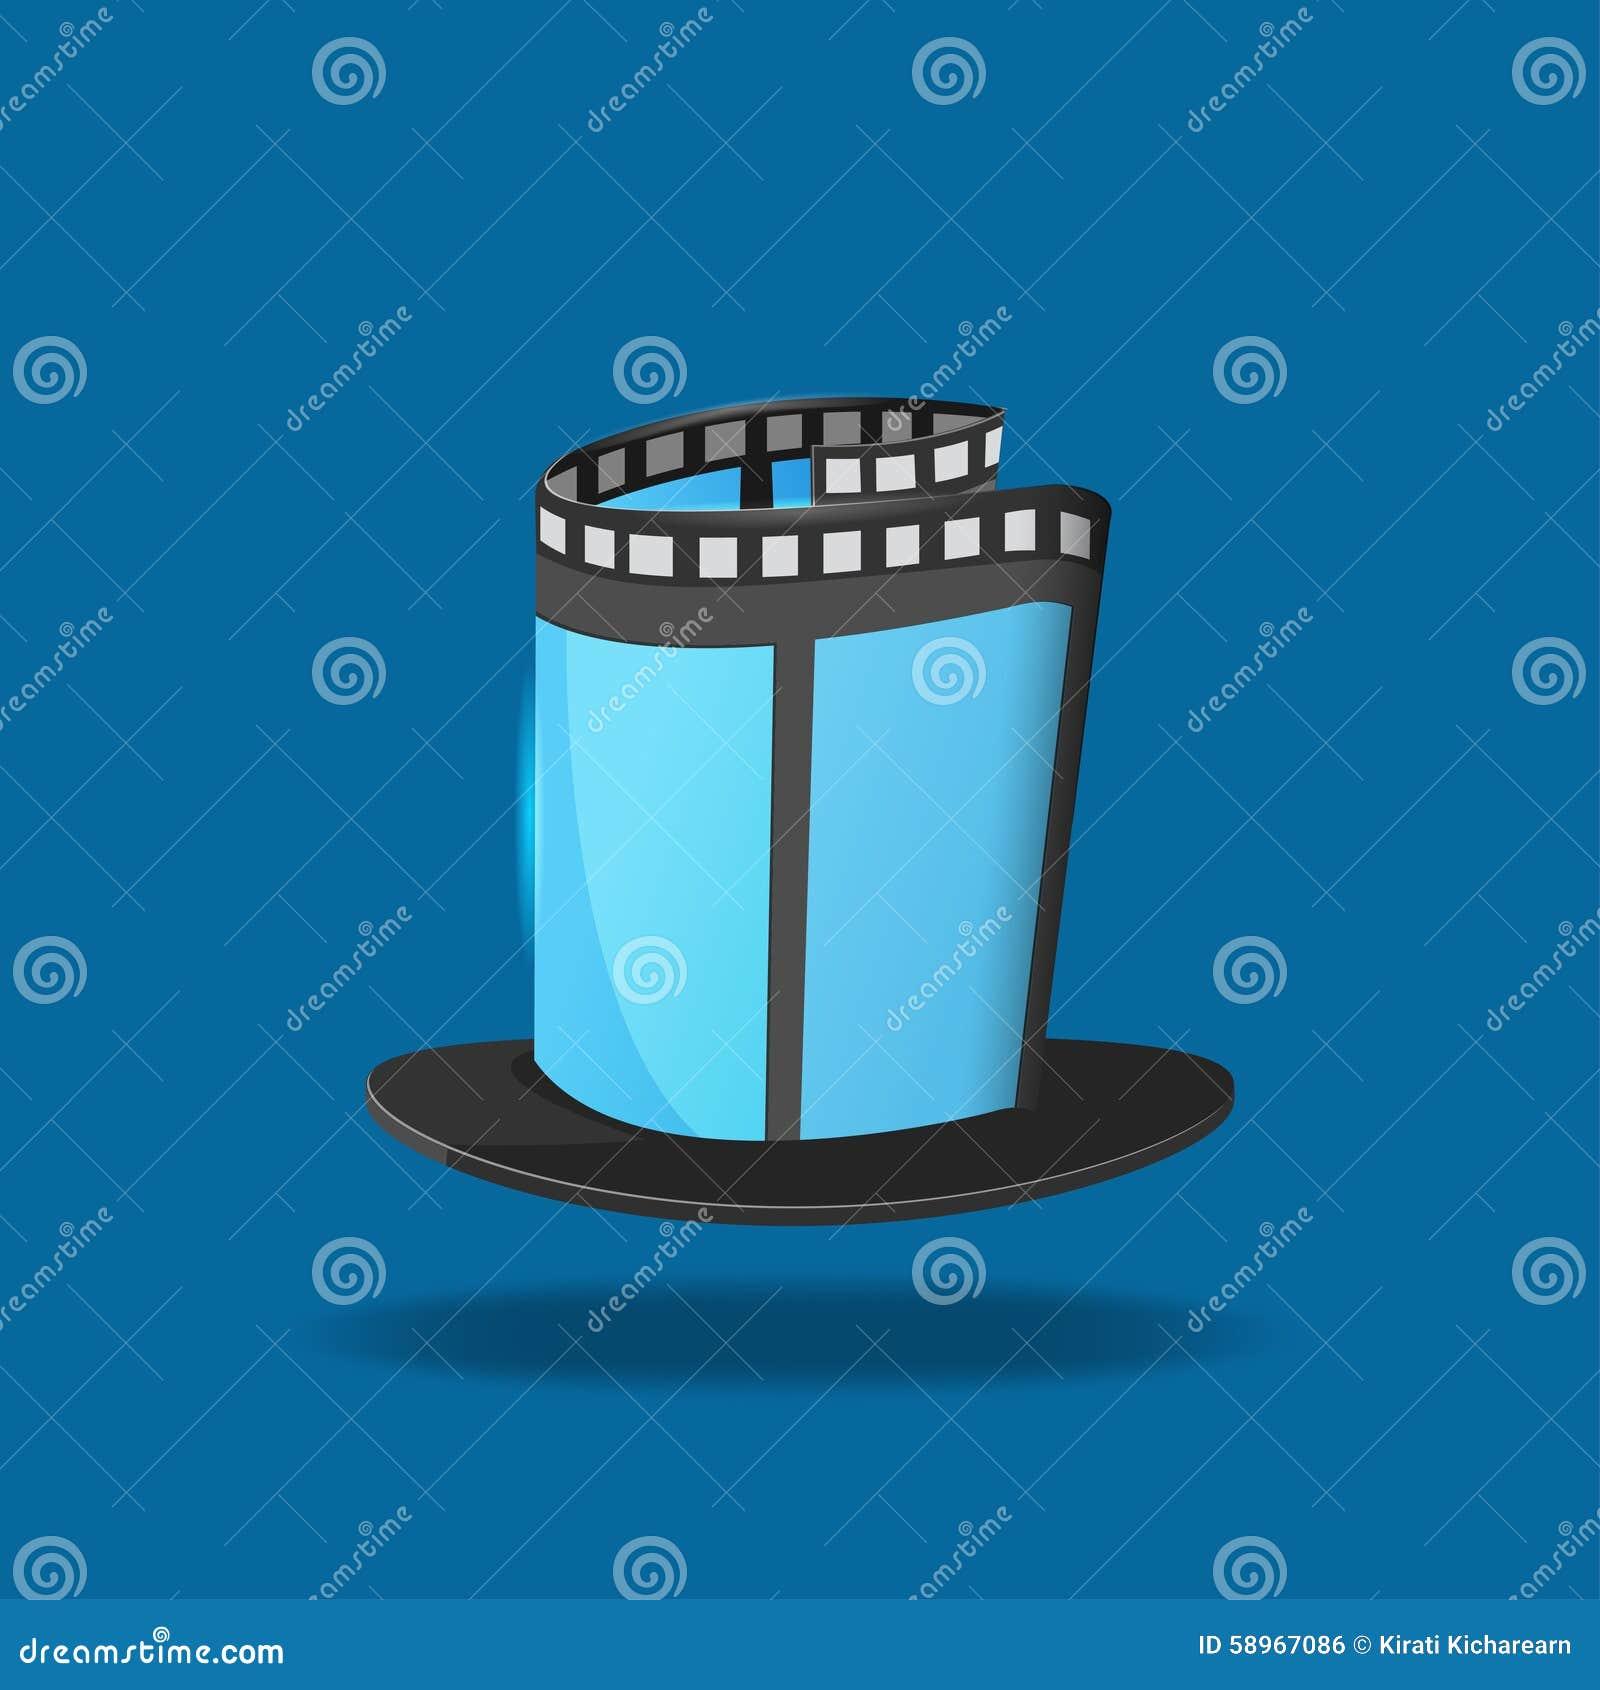 Film-Hut-magische Film-Ikone